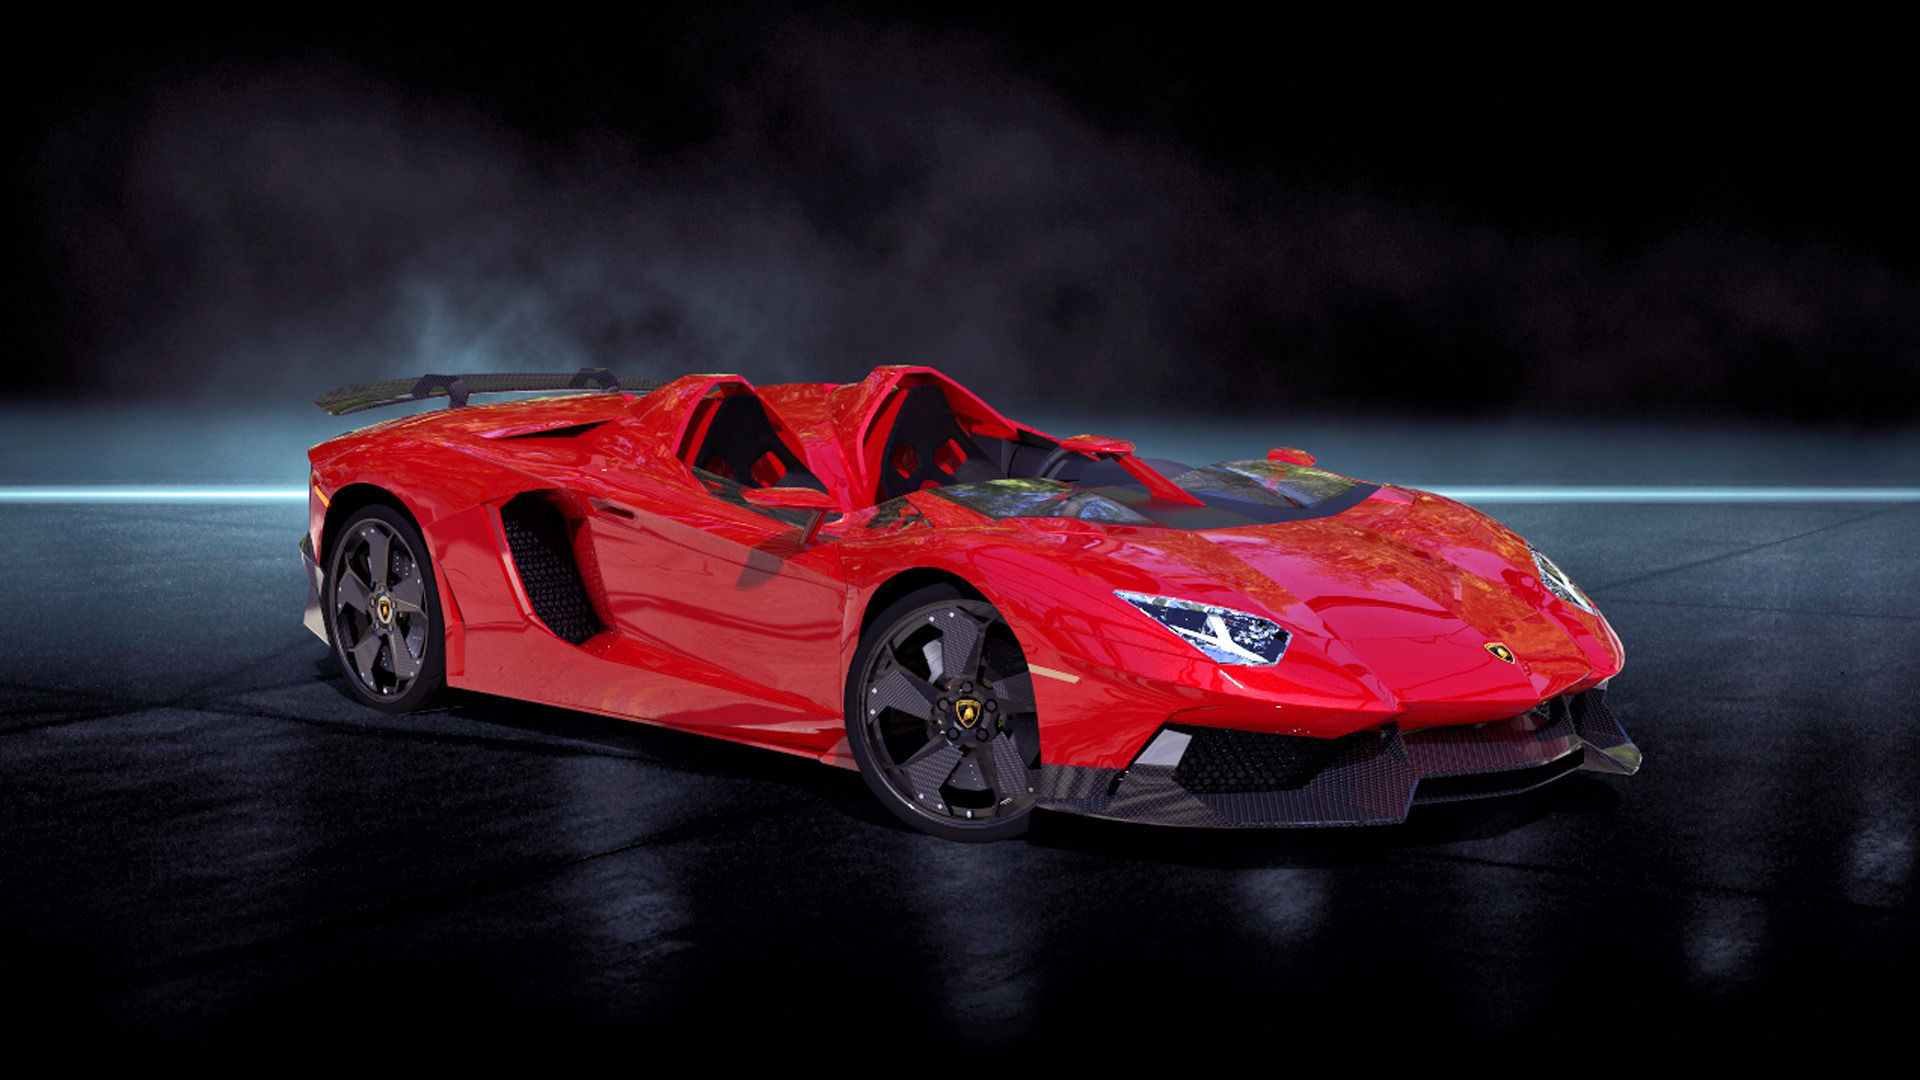 Lamborghini Aventador J 3d Model Cgtrader